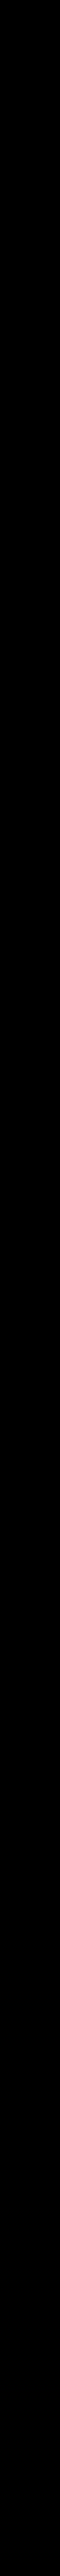 SolidBlack 350x15000